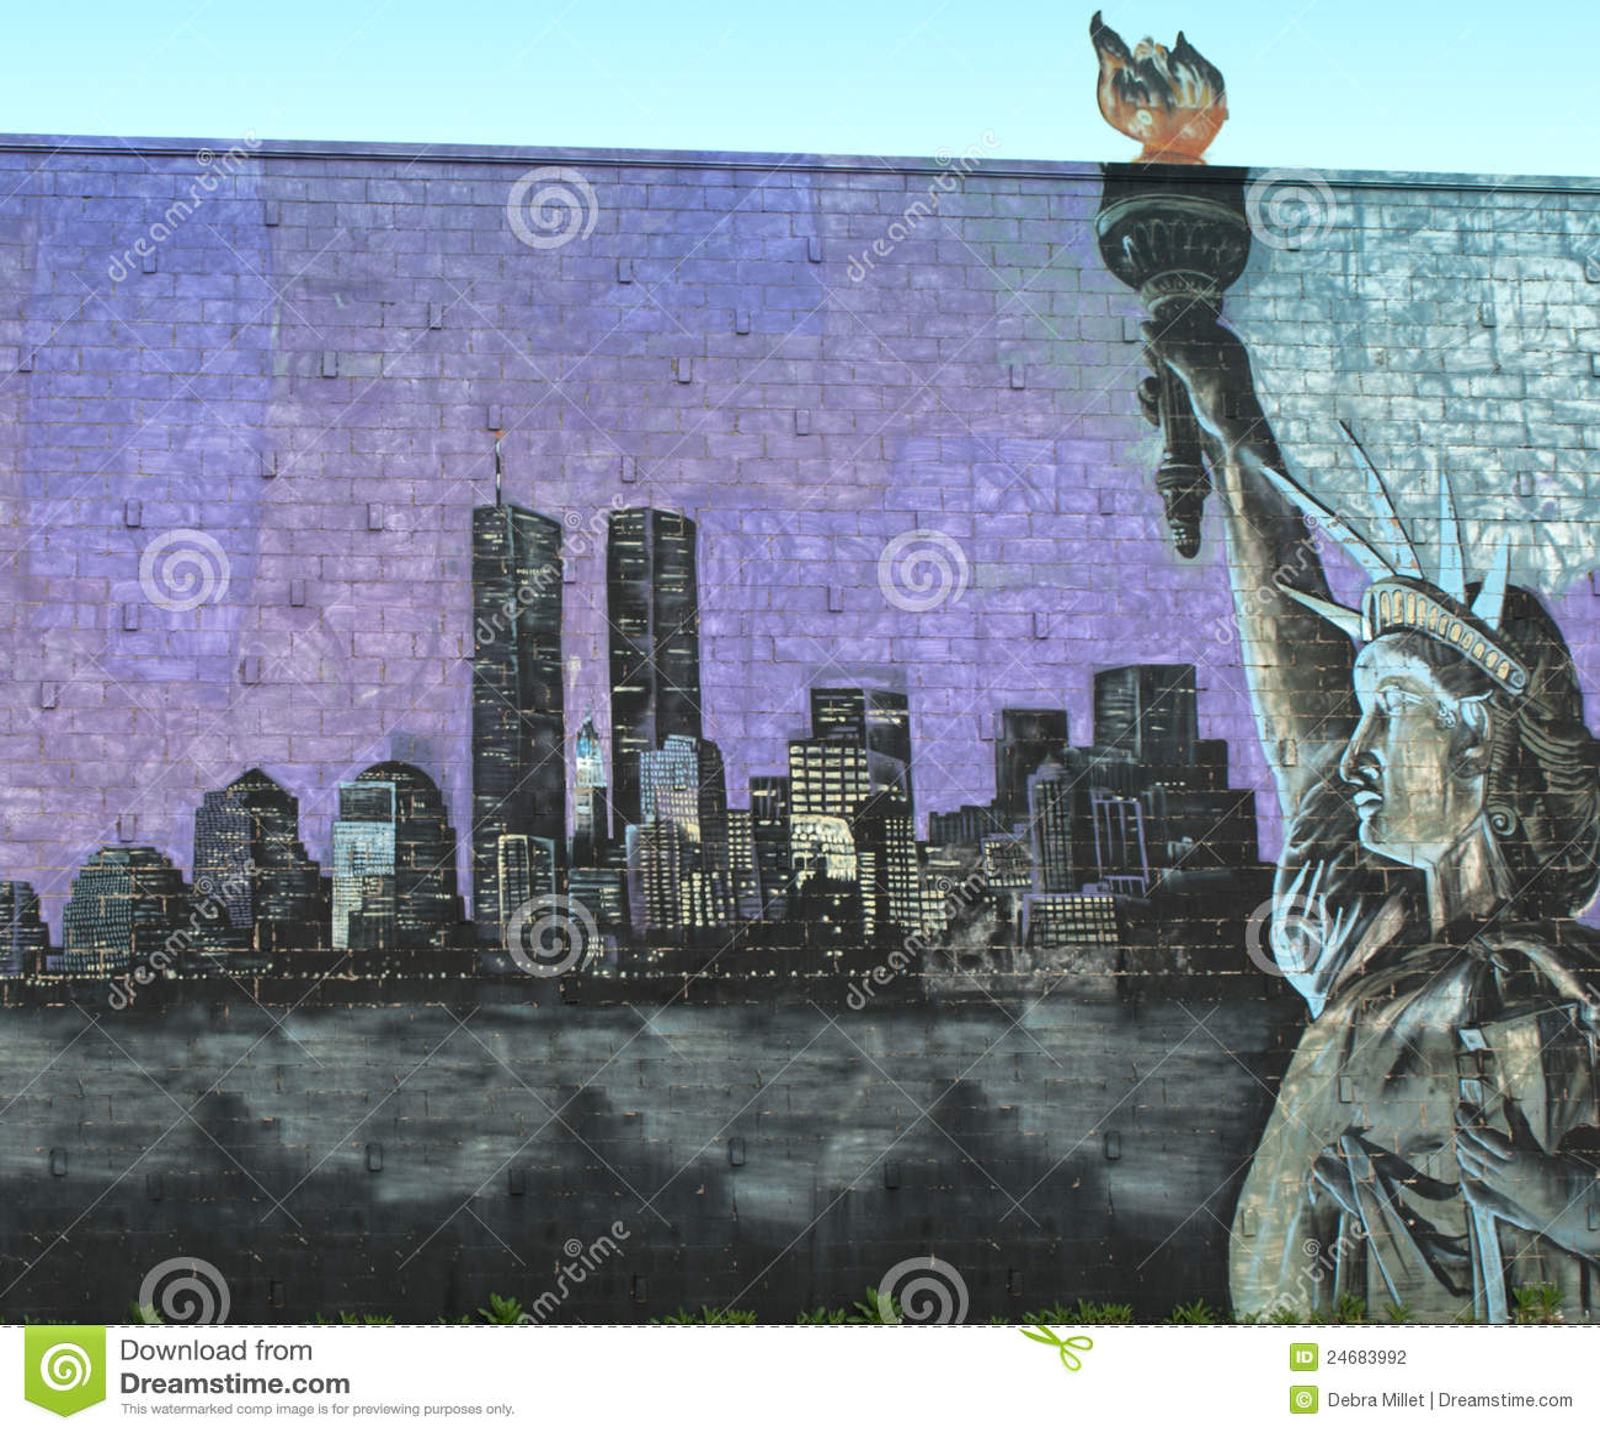 Foto Murales New York.New York City Tribute Mural Editorial Photography Image Of